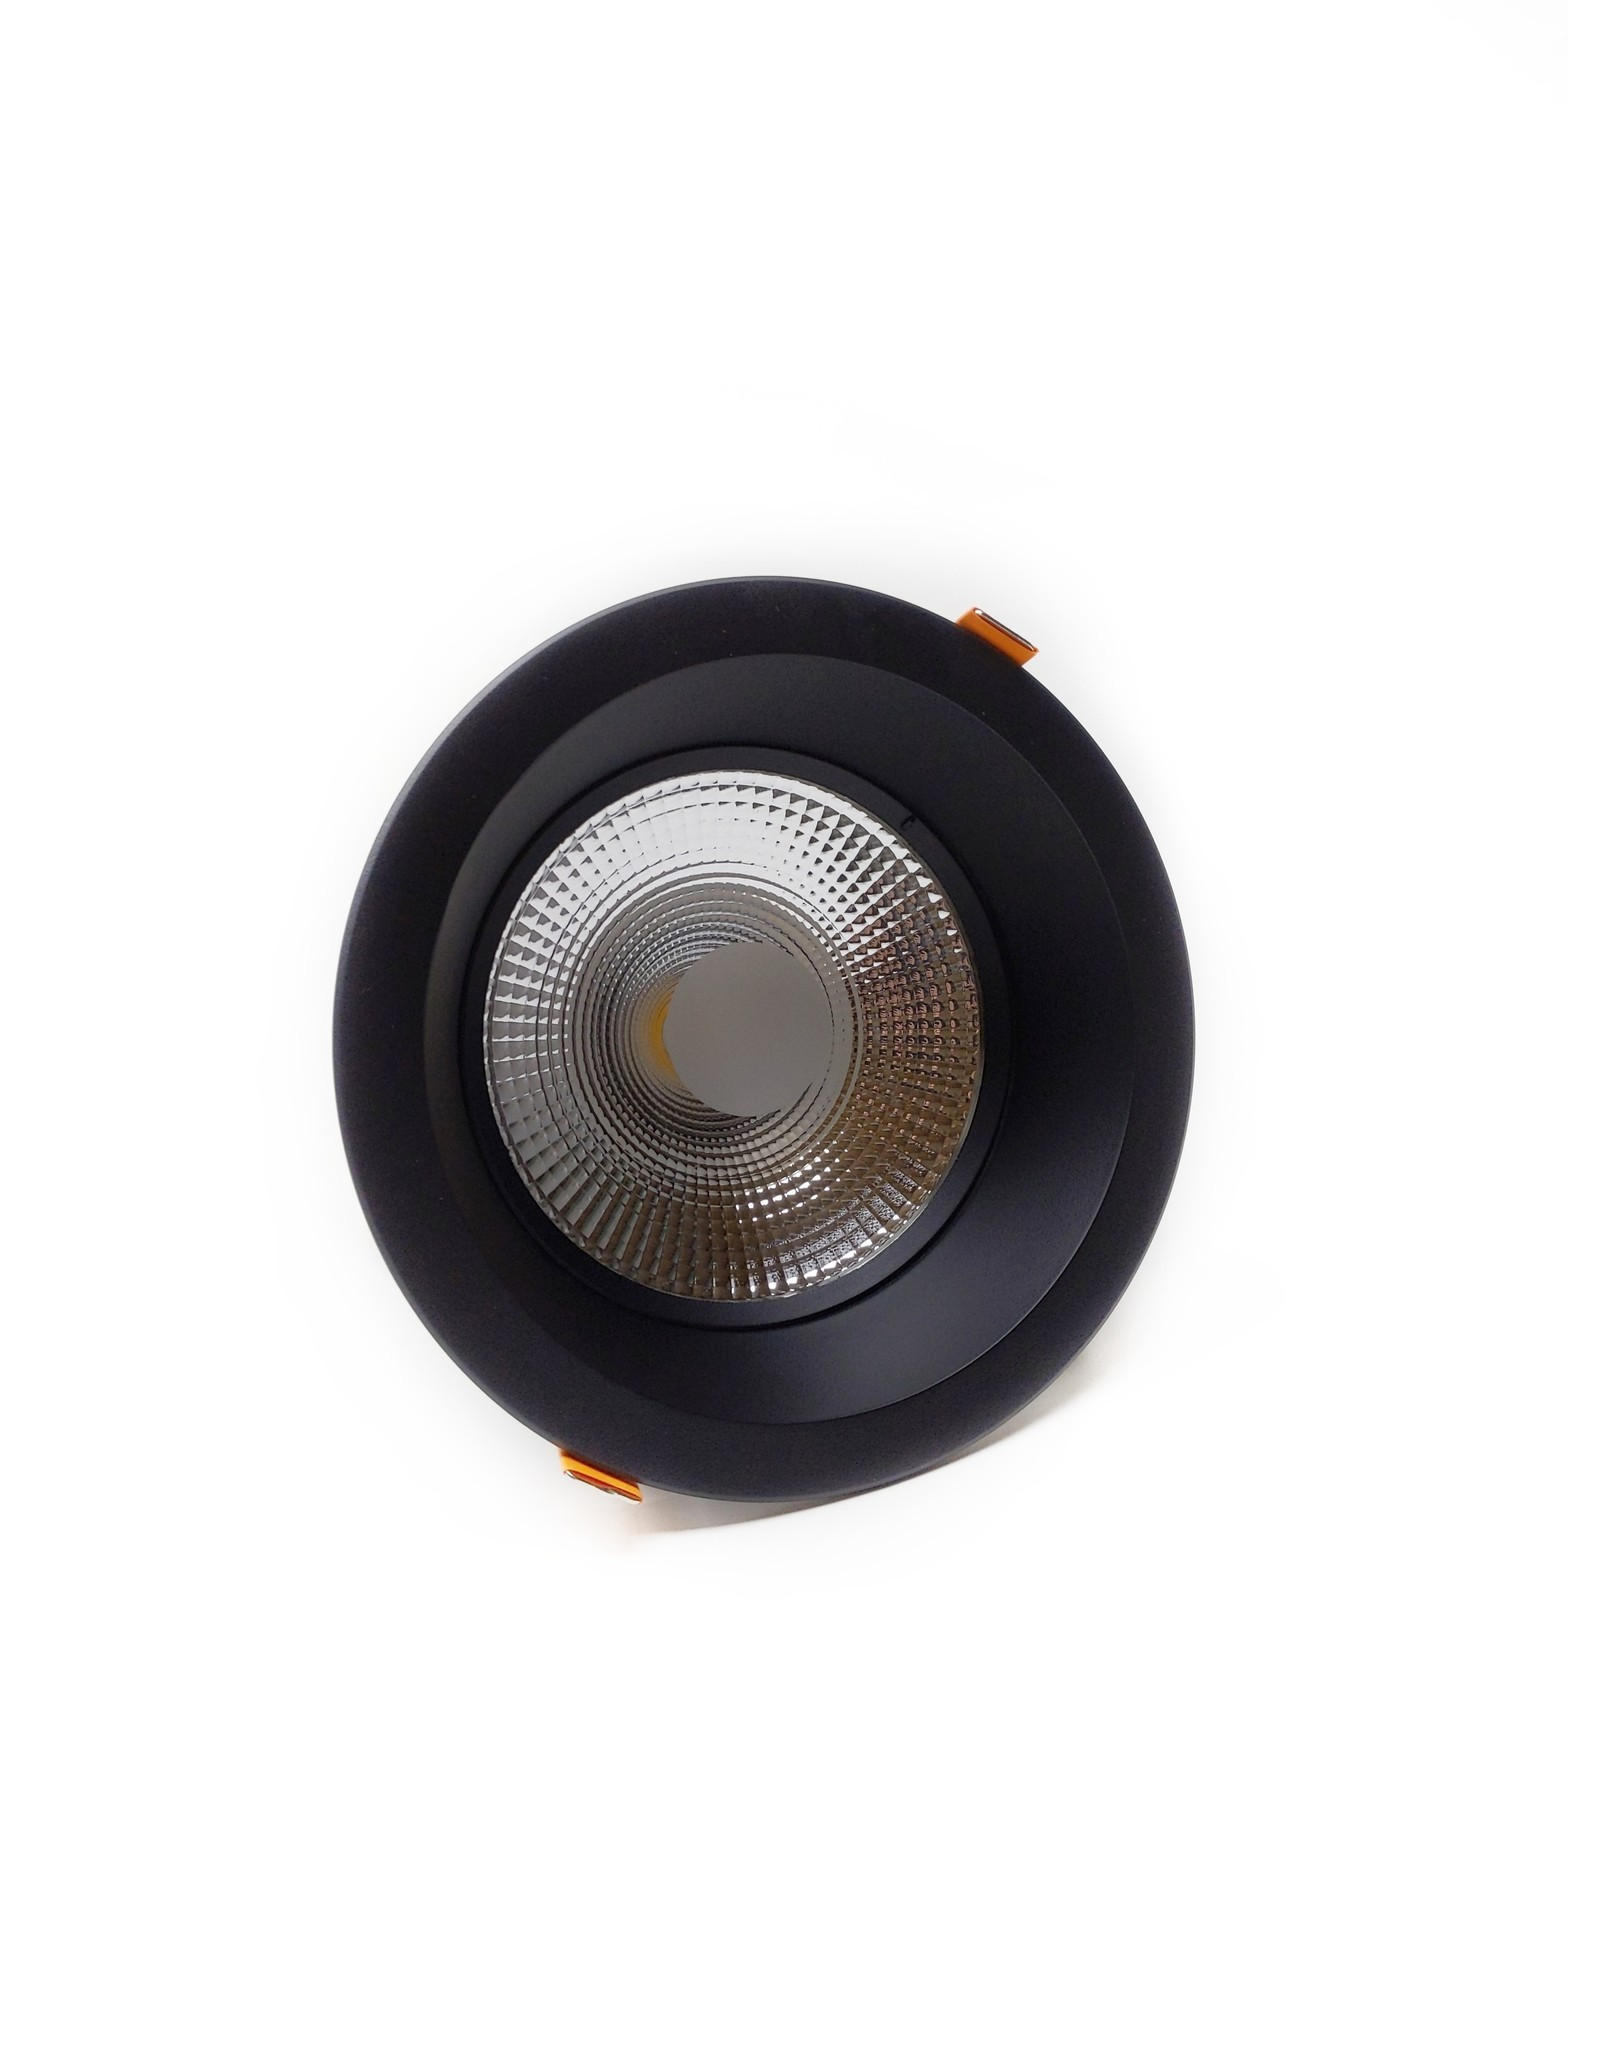 LedLed Glare Dowlight ZWART 4000k 192mm 8-20W gatmaat 165mm